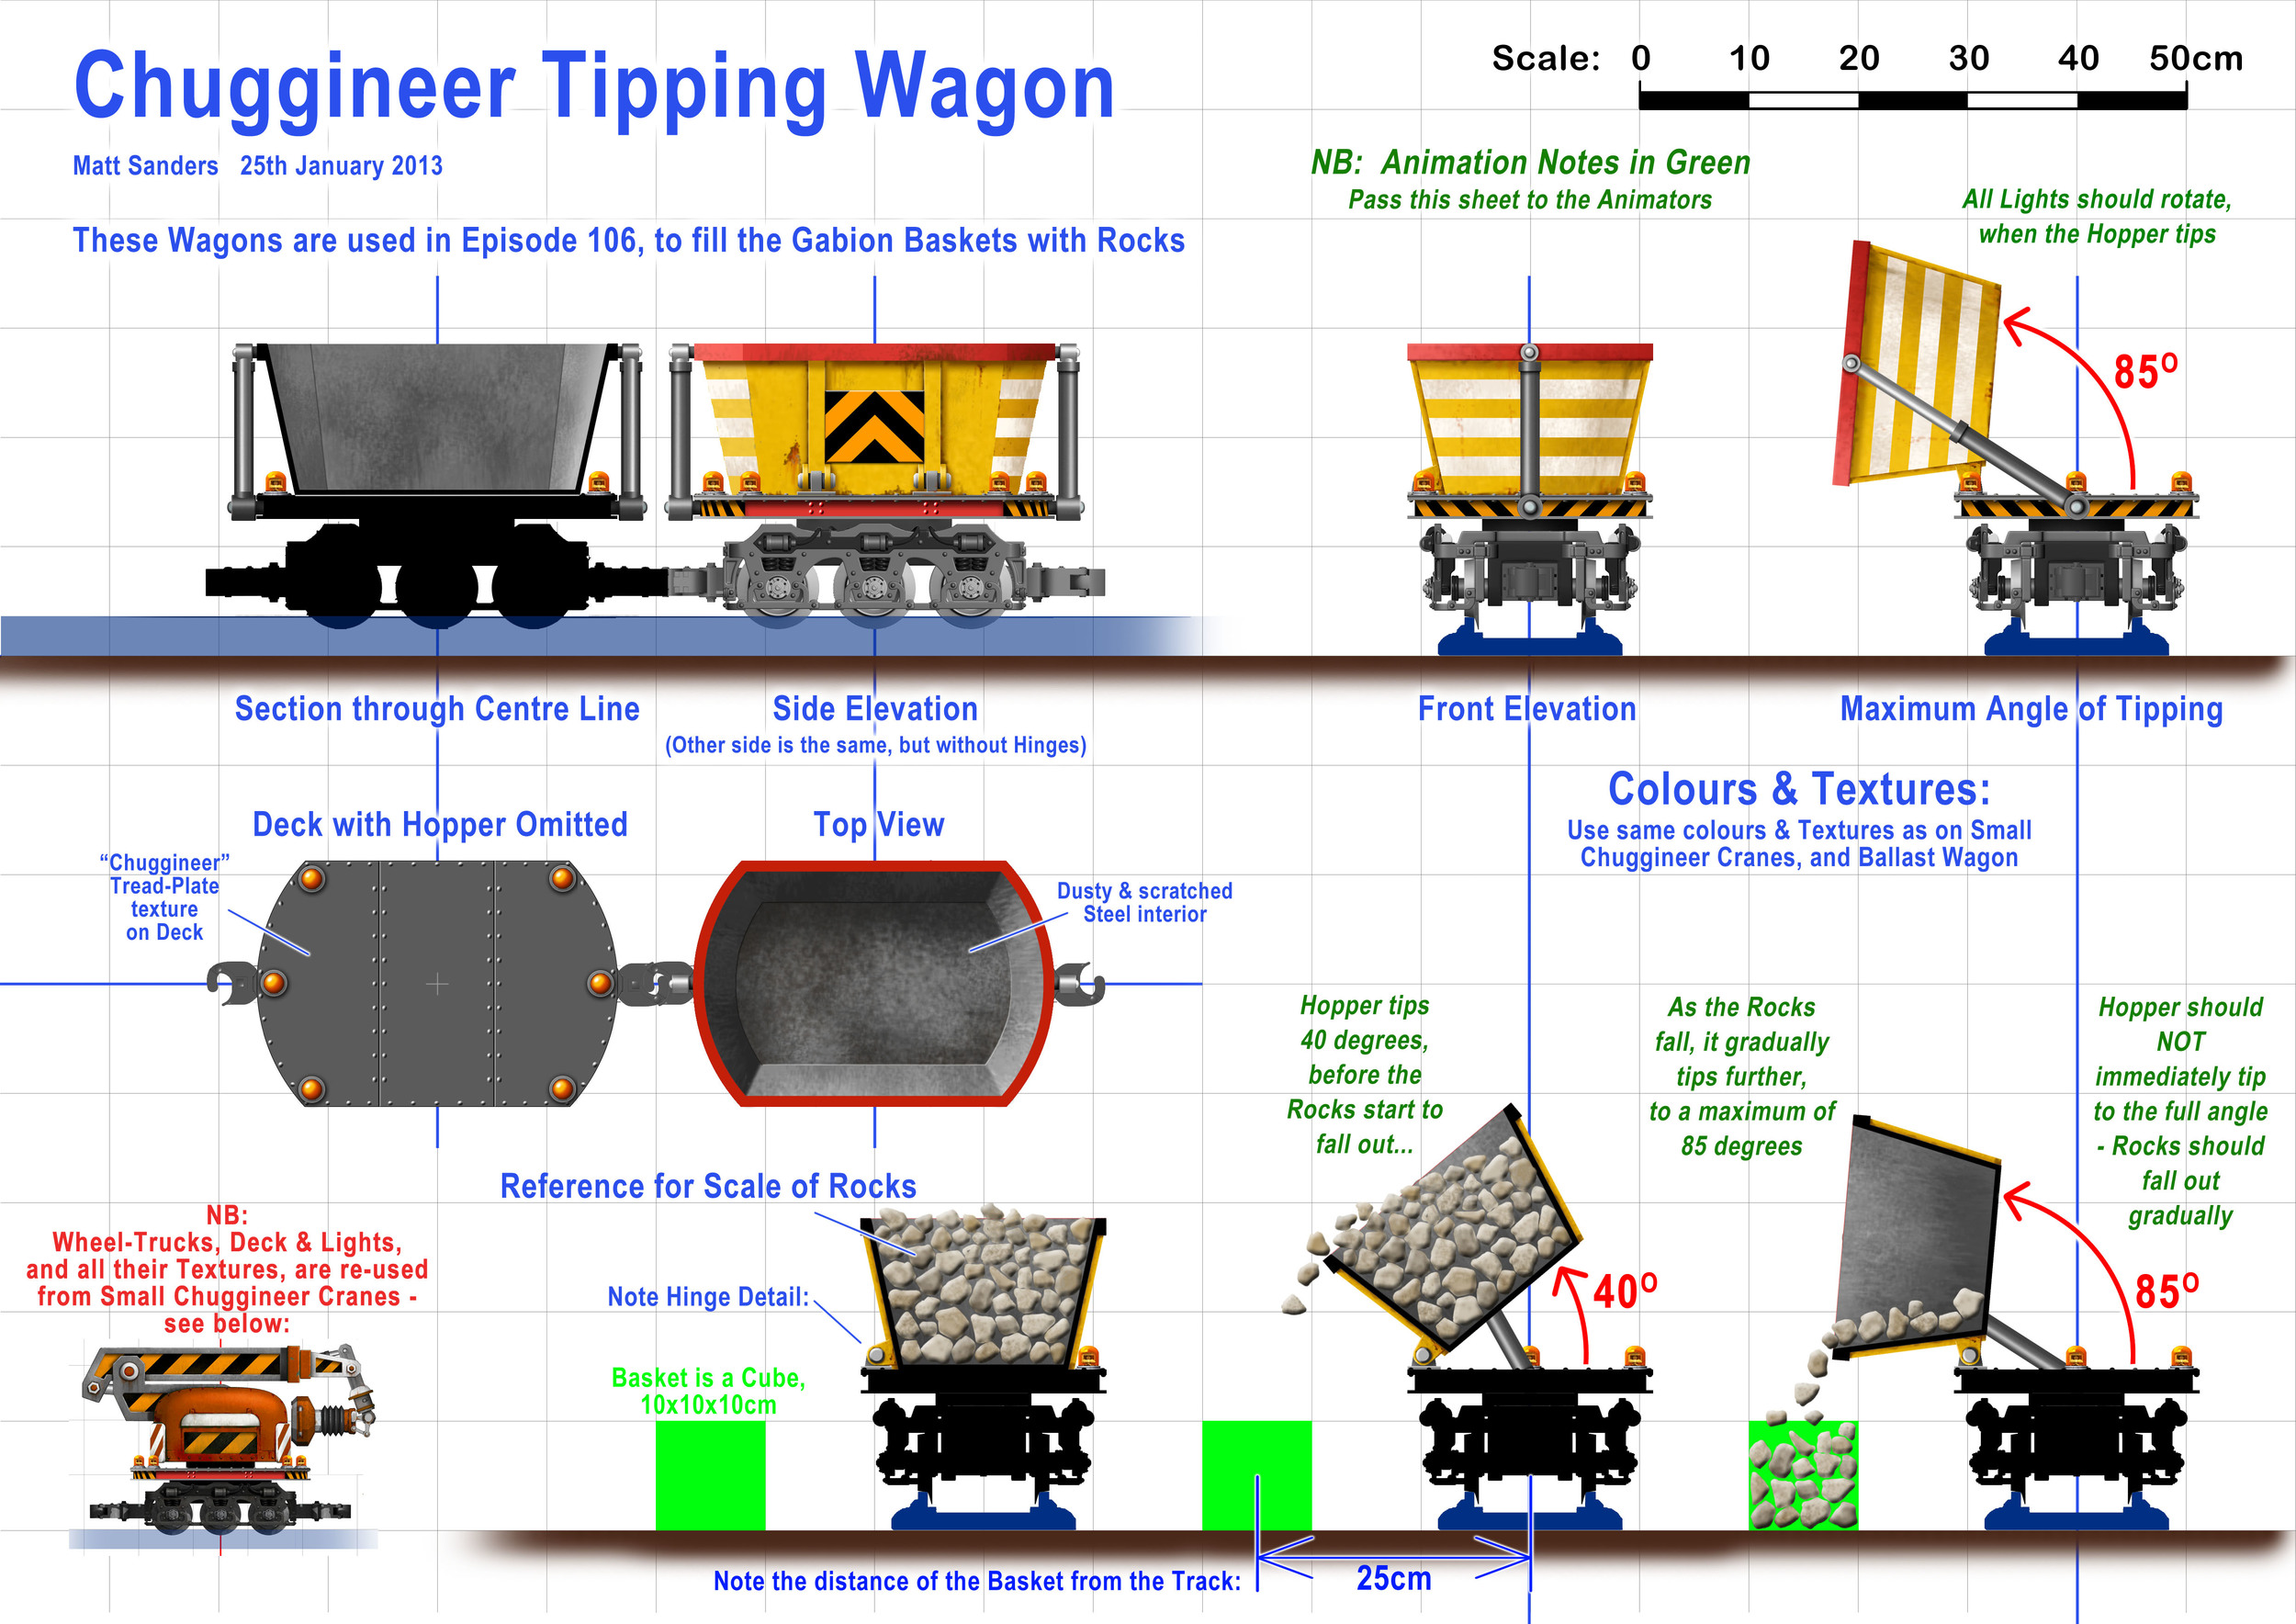 Chuggineer_Tipper_Wagon_25Jan.jpg